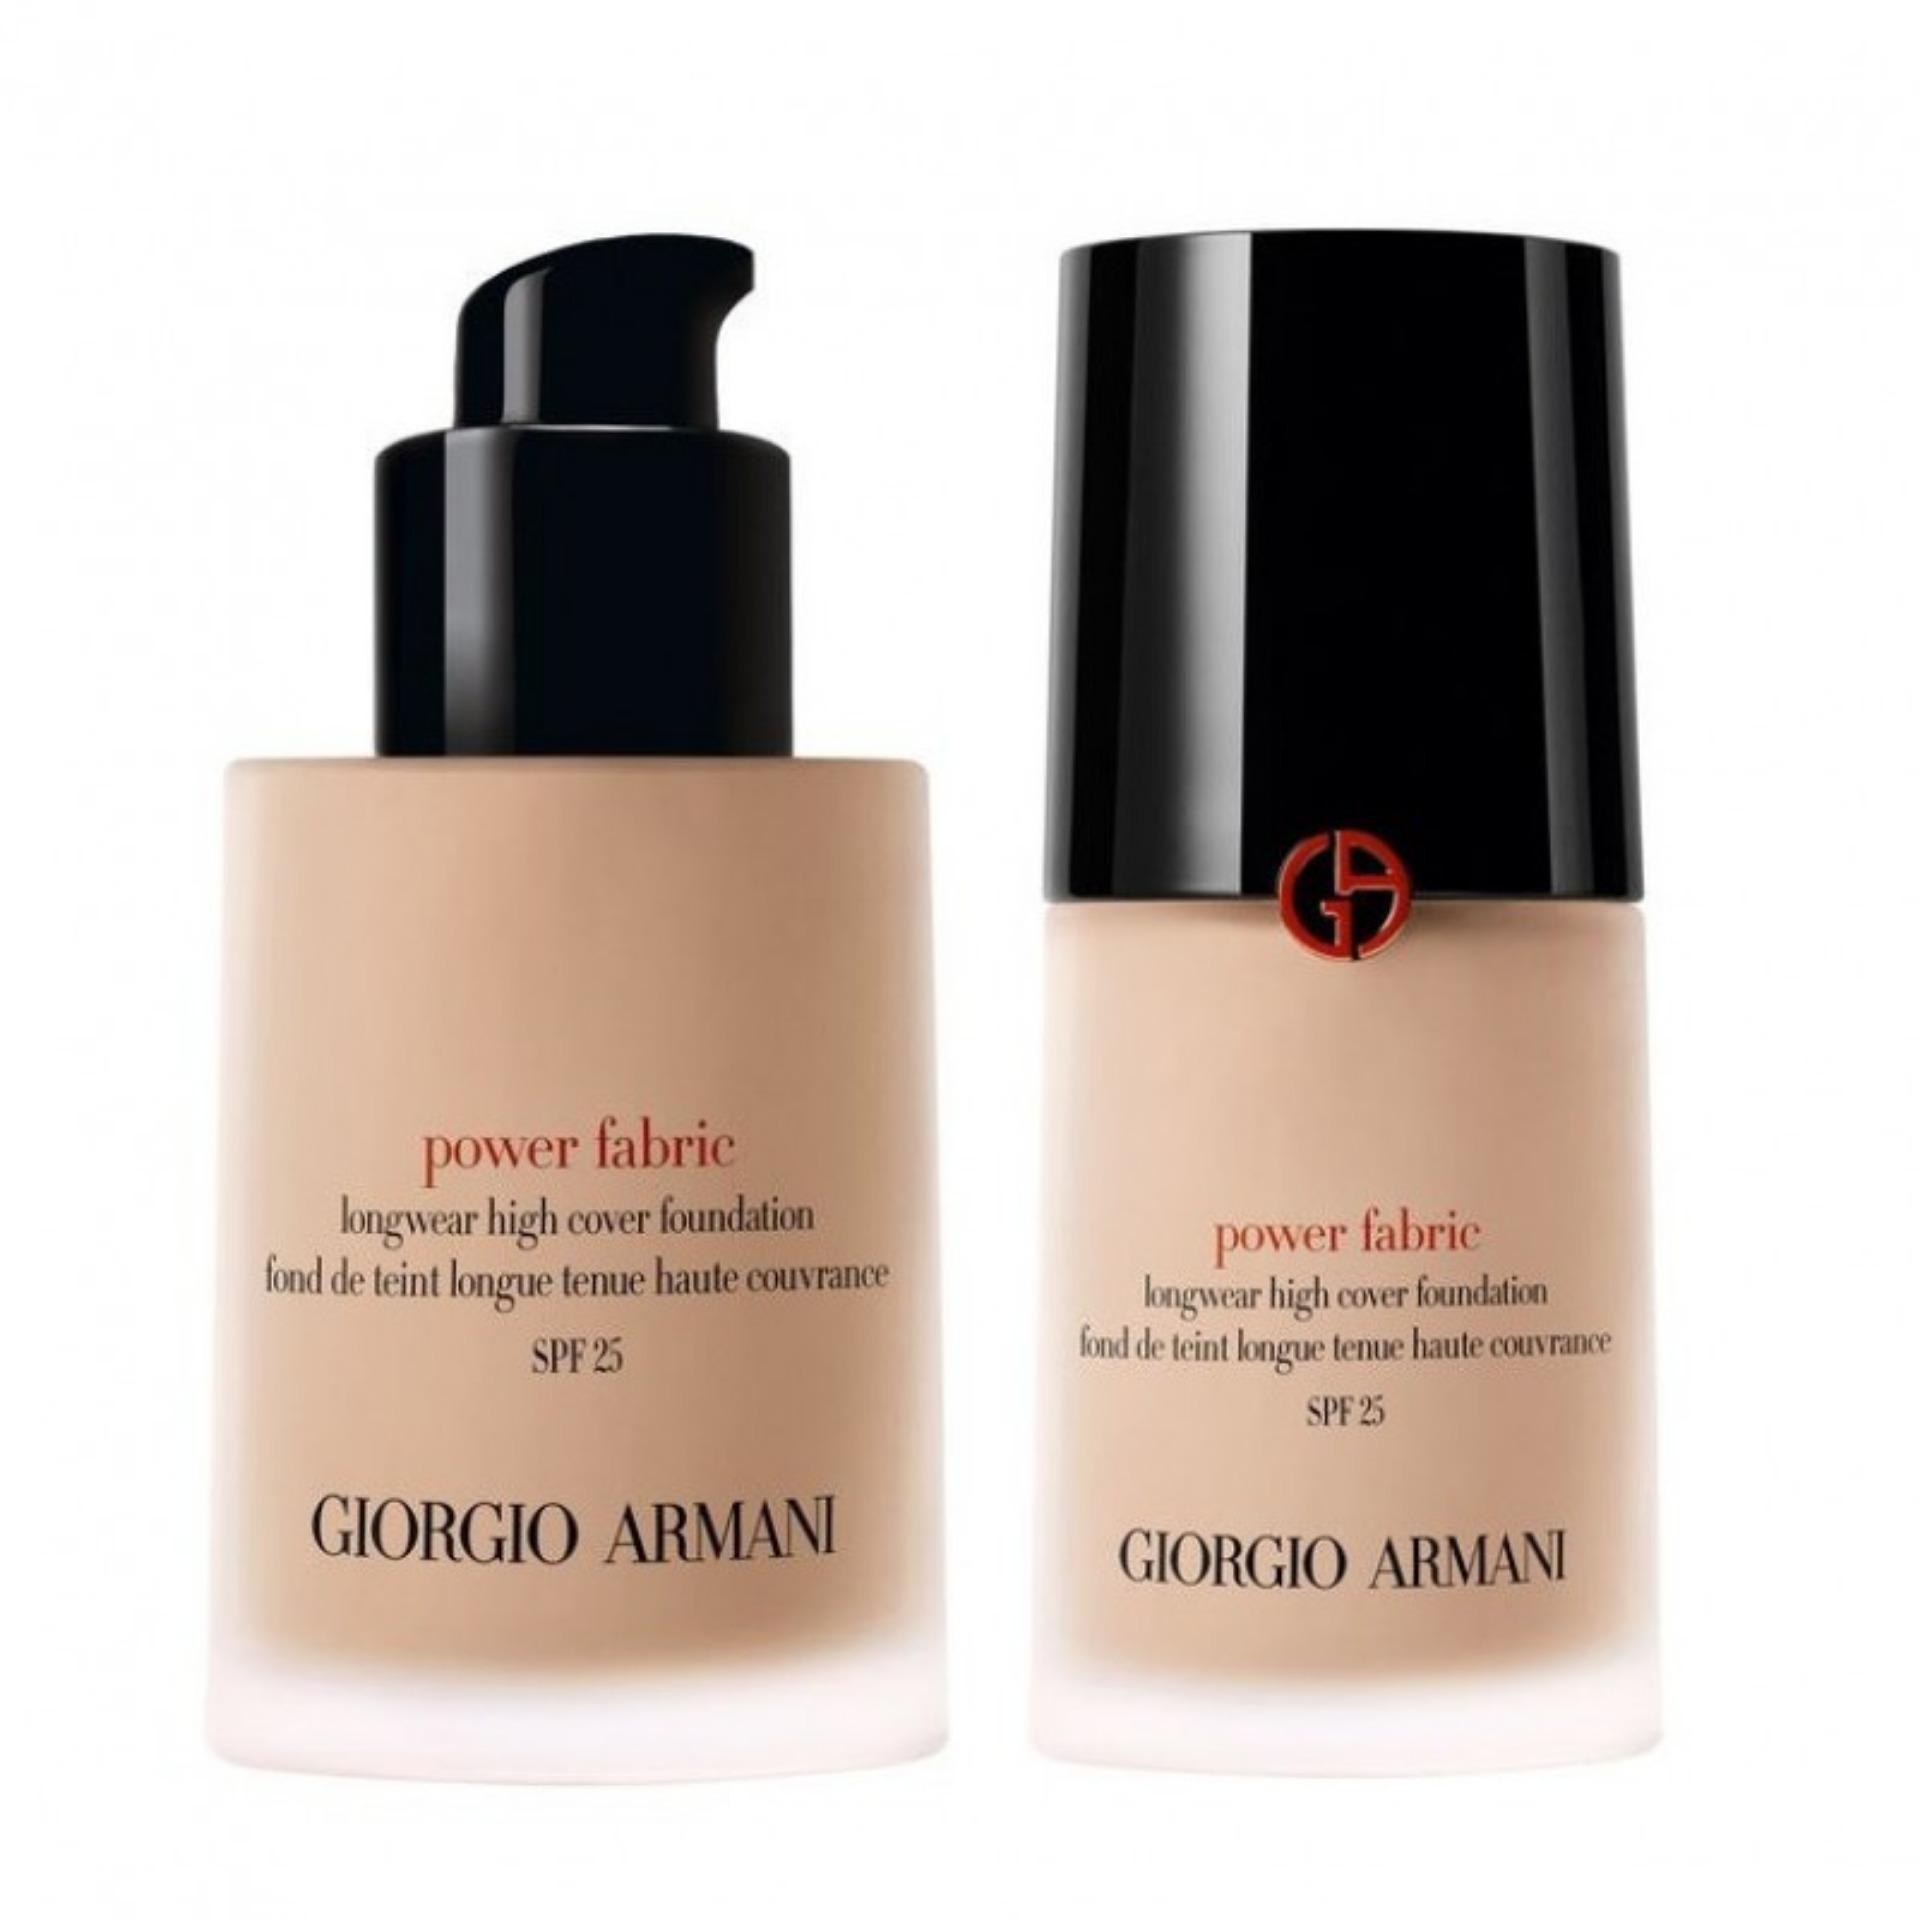 GIORGIO ARMANI Power Fabric Longwear High Cover Foundation SPF 25 - Kecantikkan, kosmetik, makeup